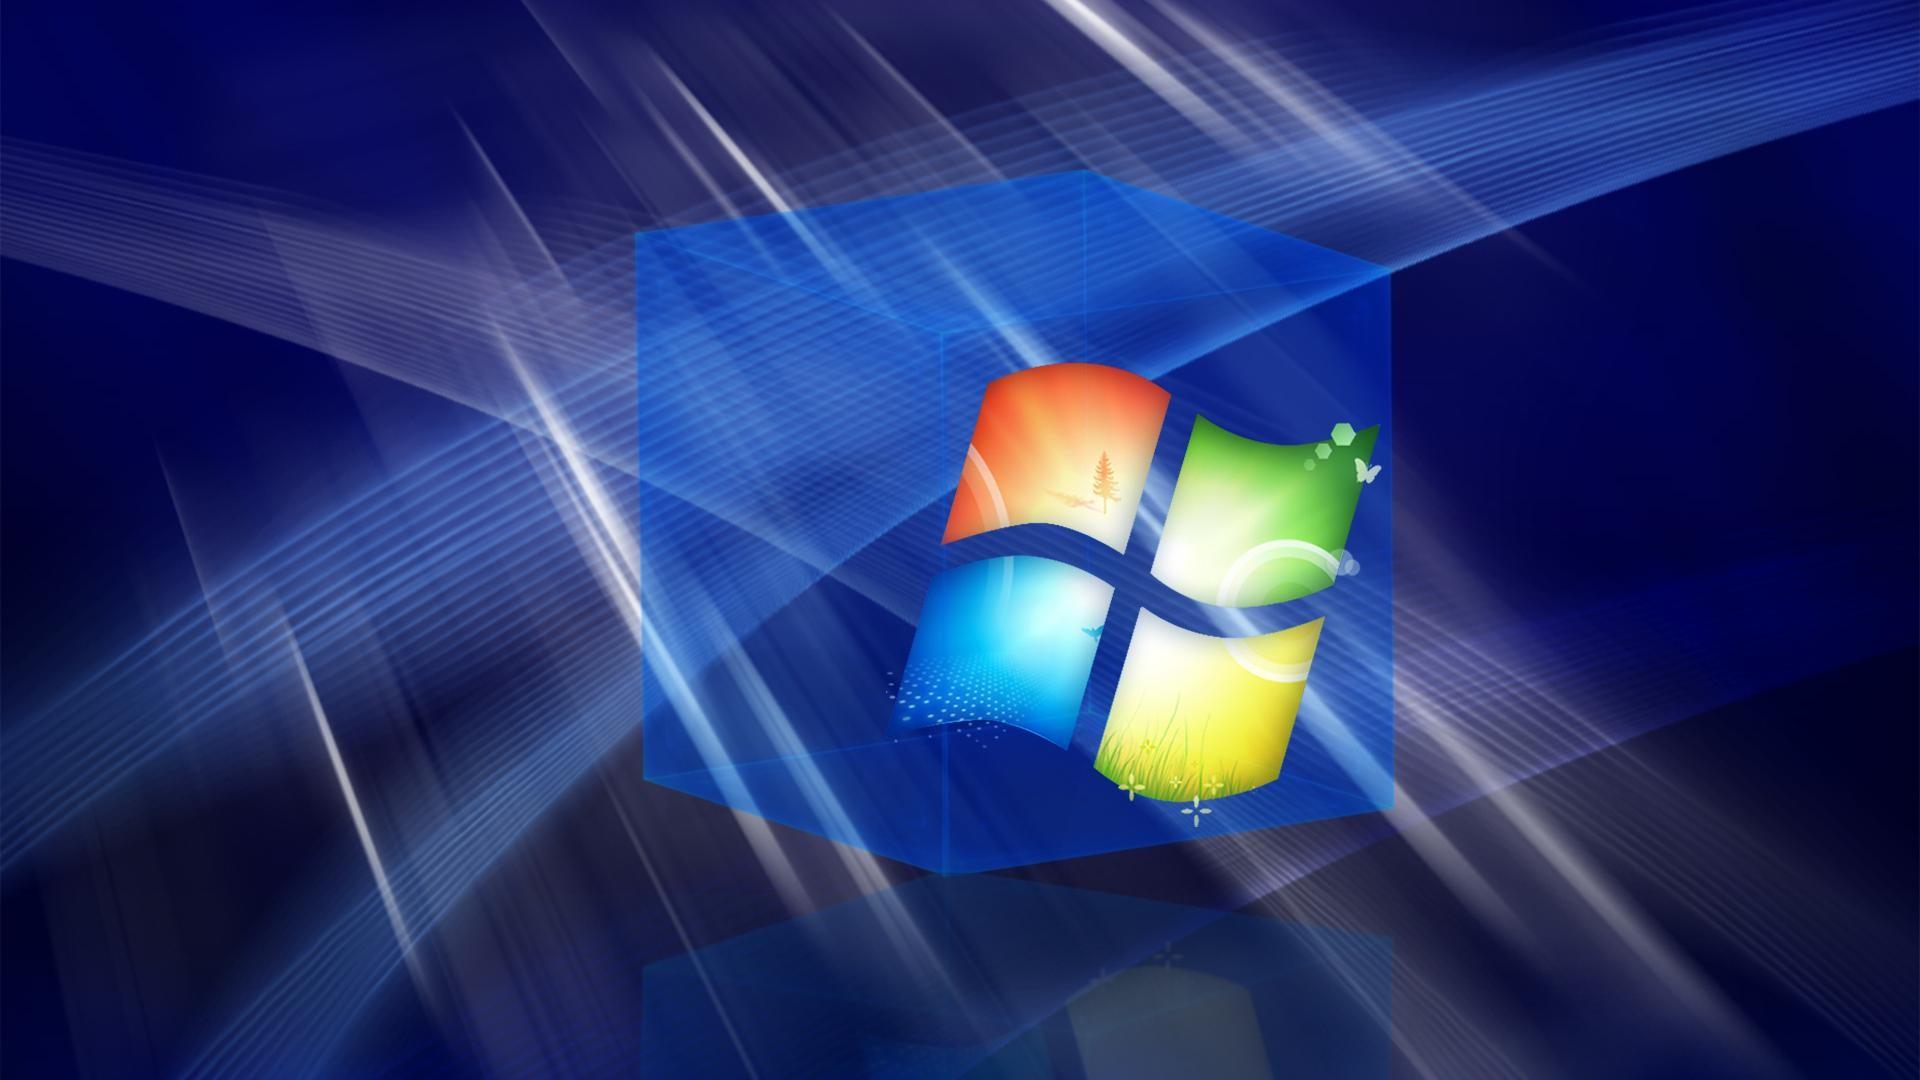 hd 3d wallpapers 1080p widescreen windows 7 (1) – HD Beautiful Desktop .